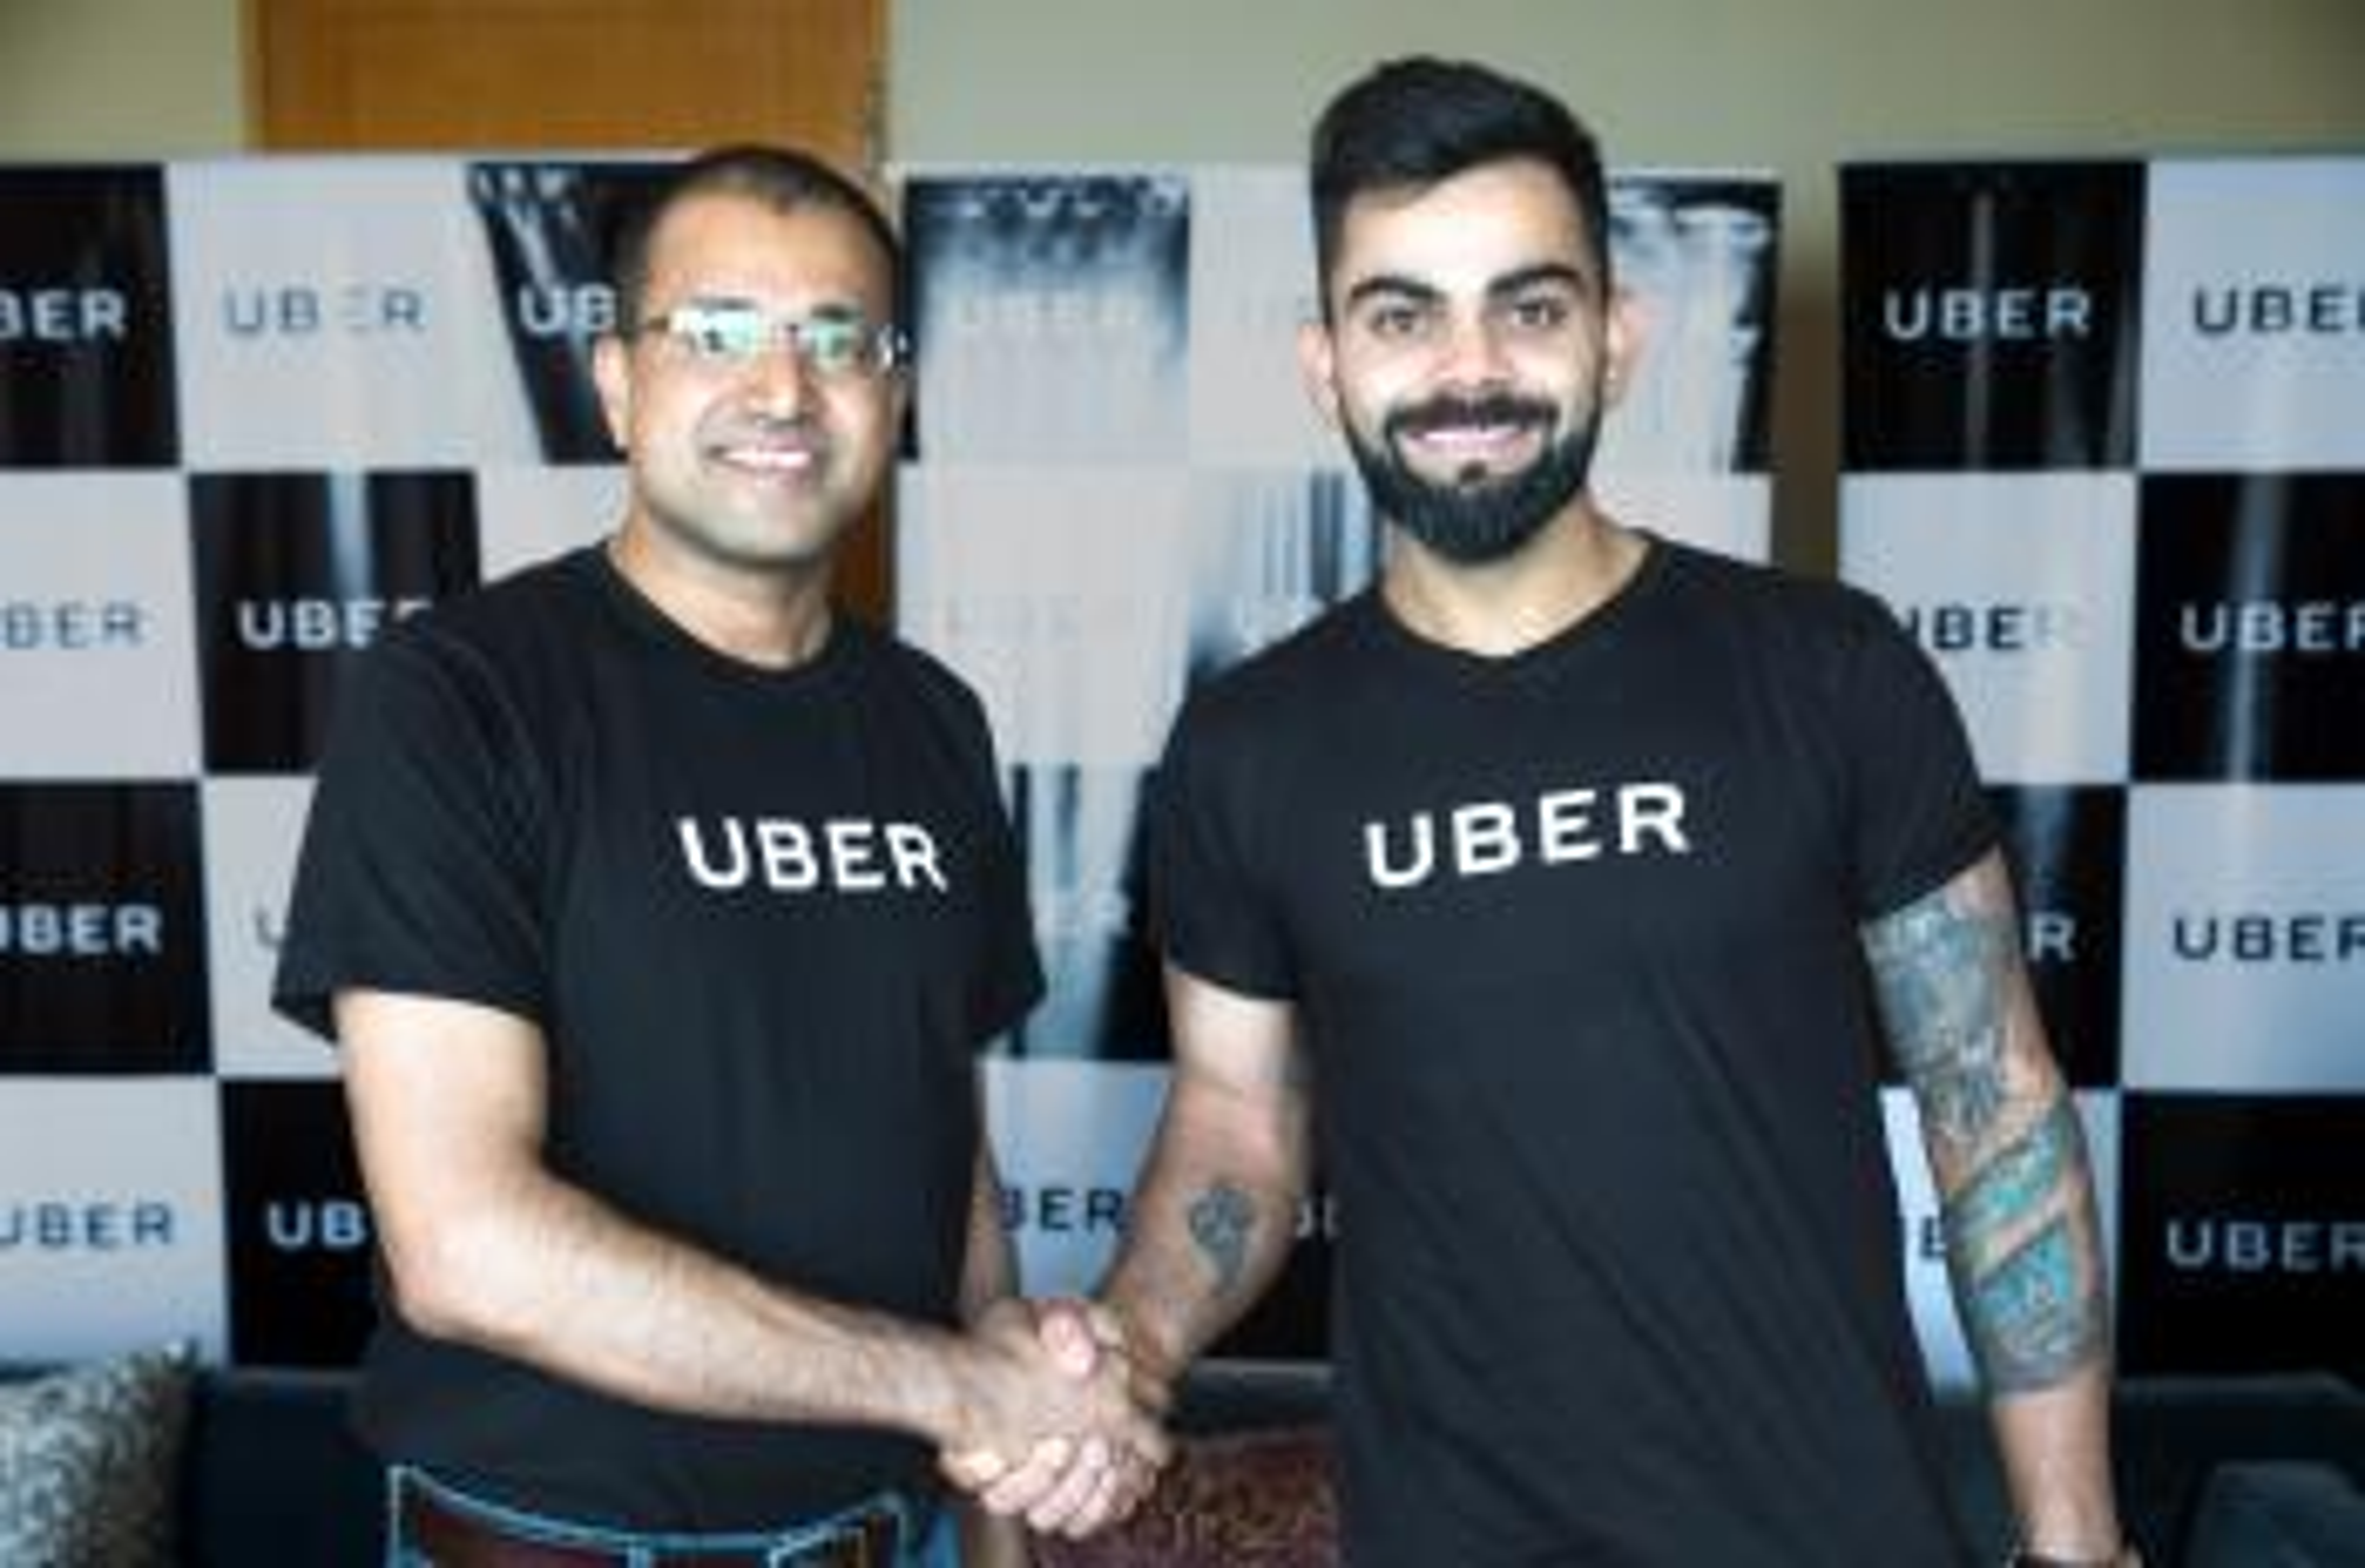 Amit Jain, President, Uber India & SA with Uber India's Brand Ambassador, Virat Kohli, Captain, Indian Cricket Team